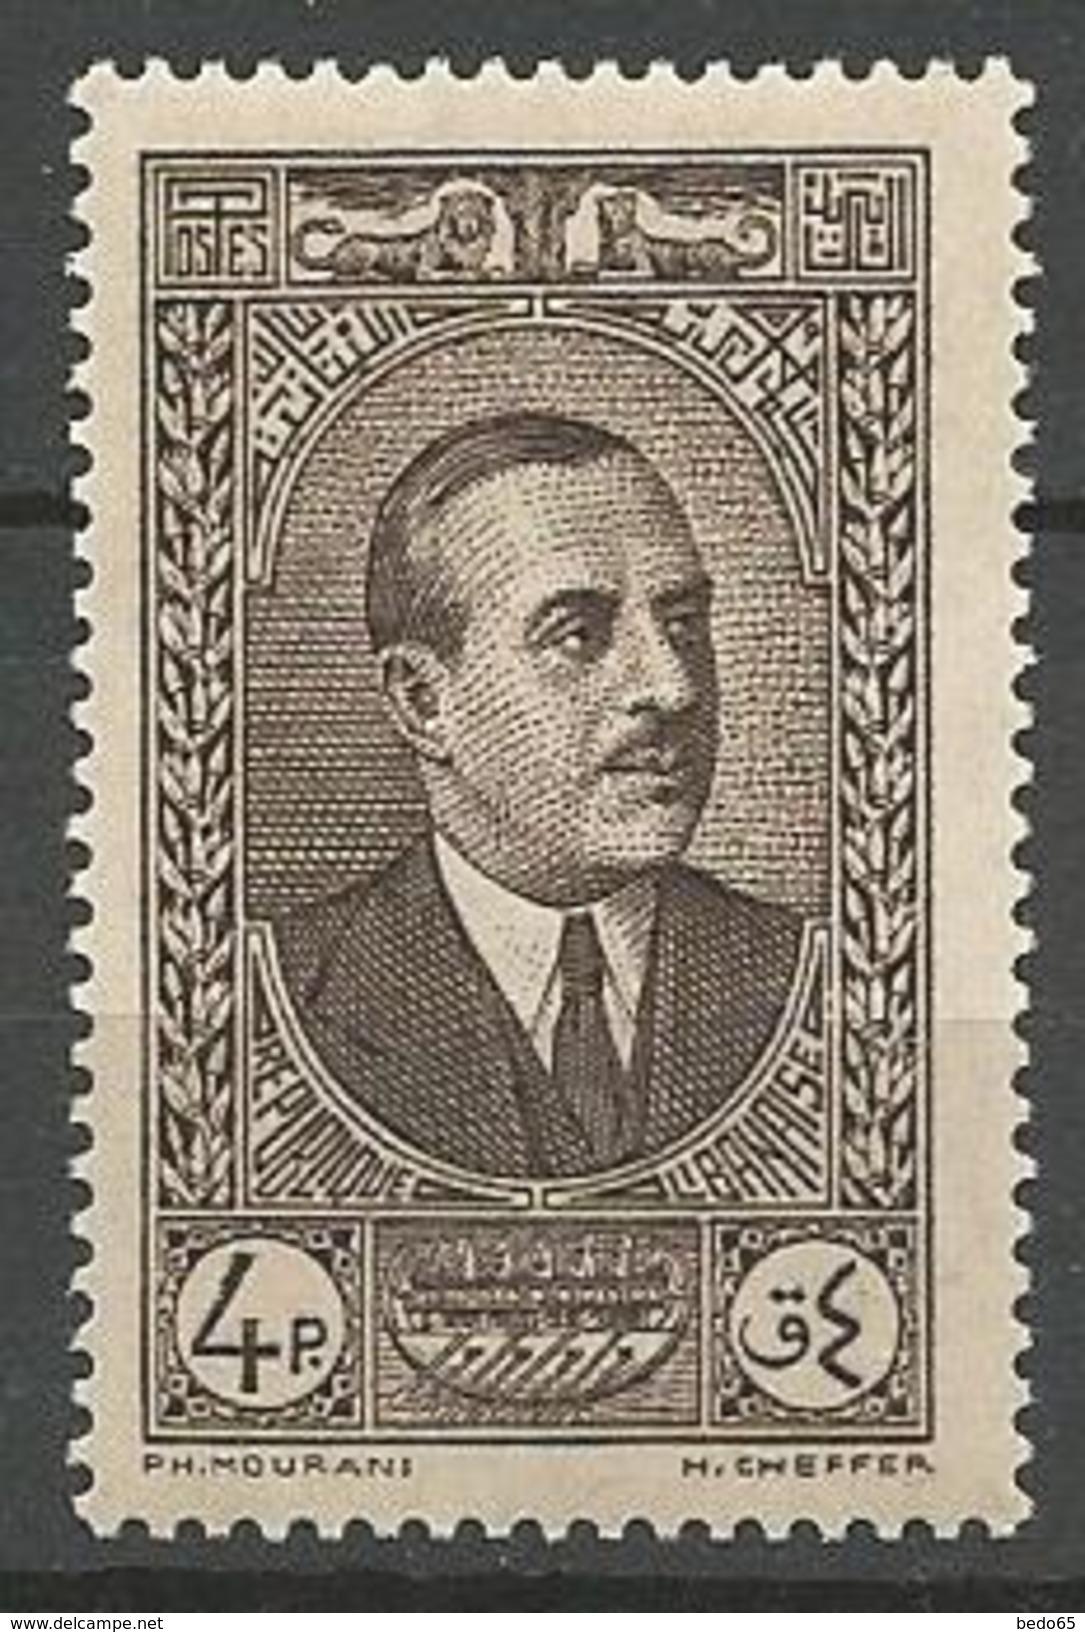 GRAND LIBAN   N° 153 NEUF** LUXE   SANS CHARNIERE / MNH - Grand Liban (1924-1945)